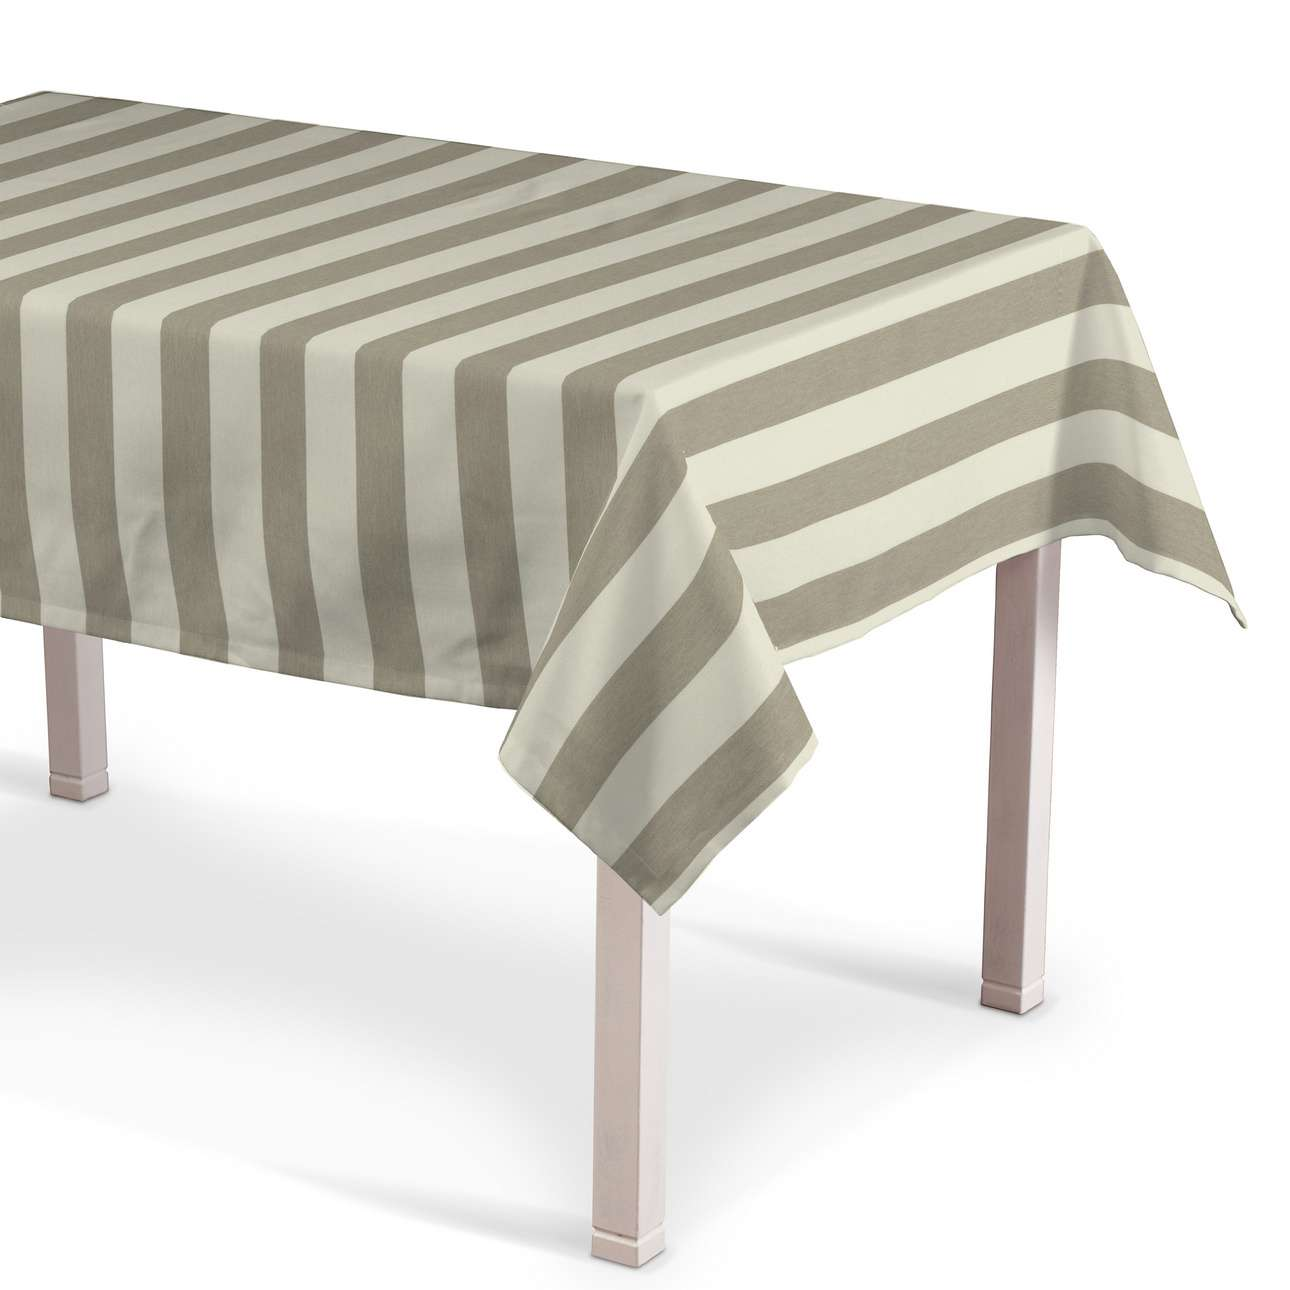 Rektangulære borddug fra kollektionen Quadro II, Stof: 142-73